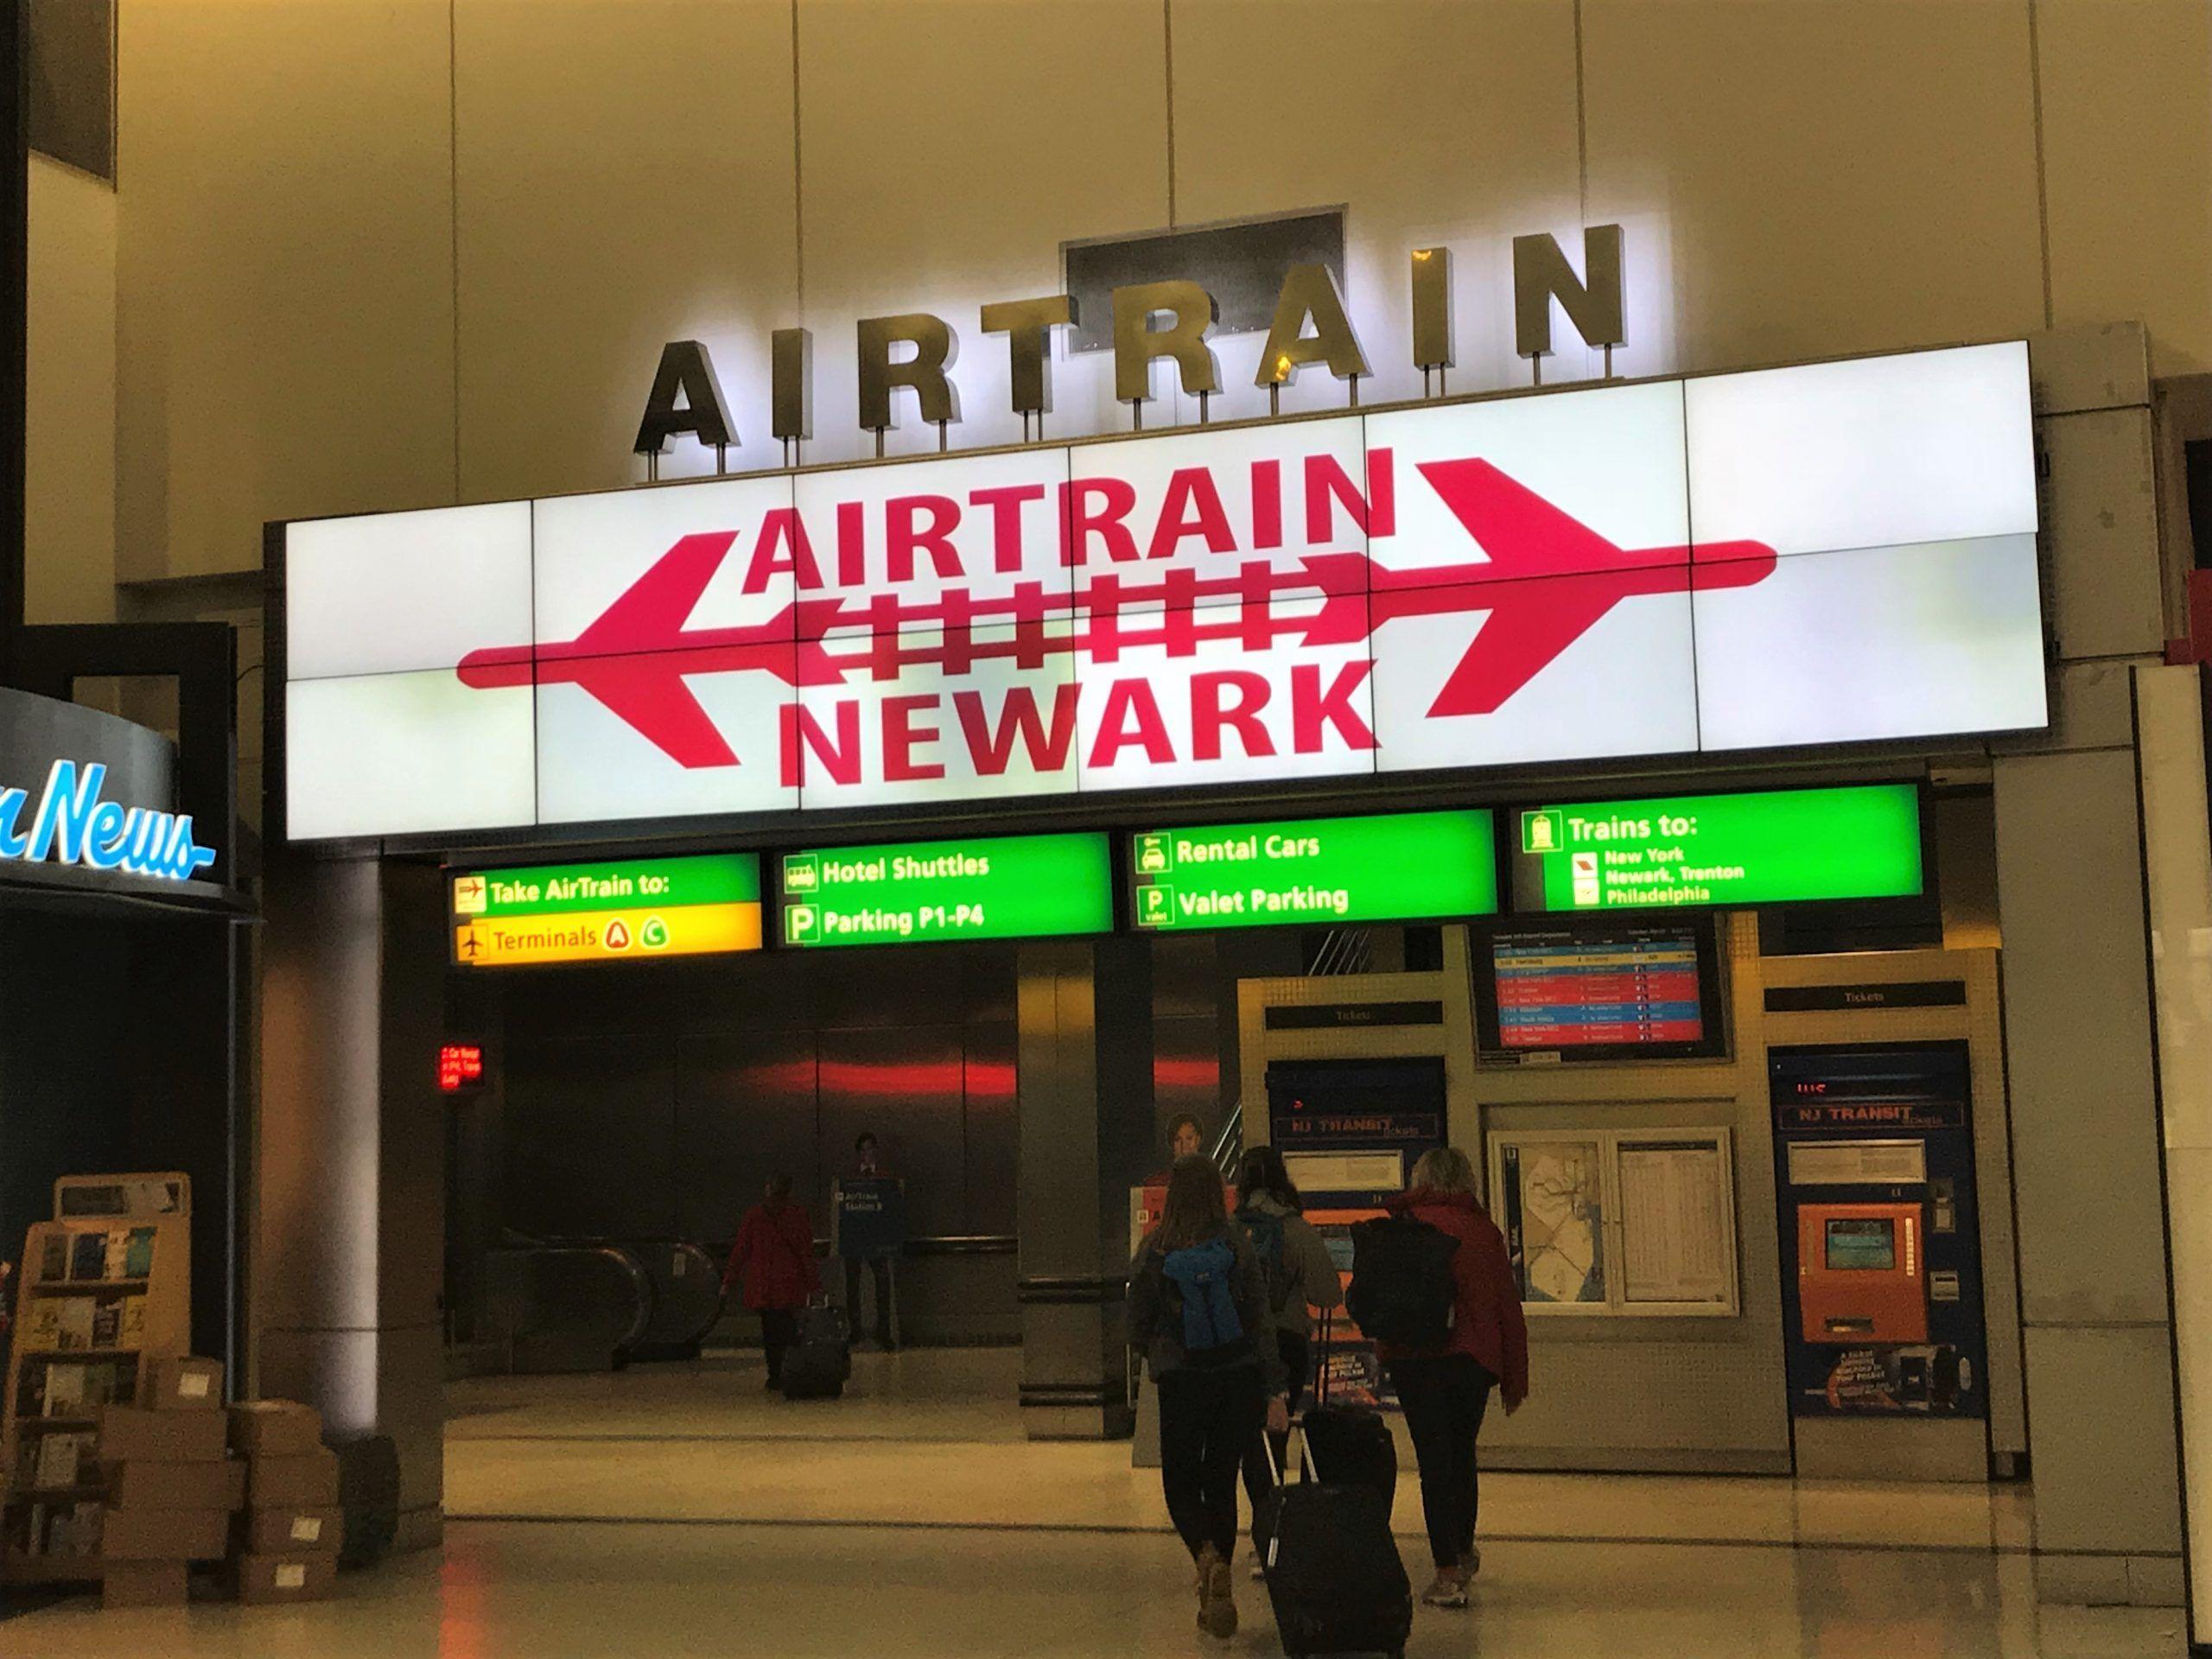 Aeropuerto de Newark Airtrain